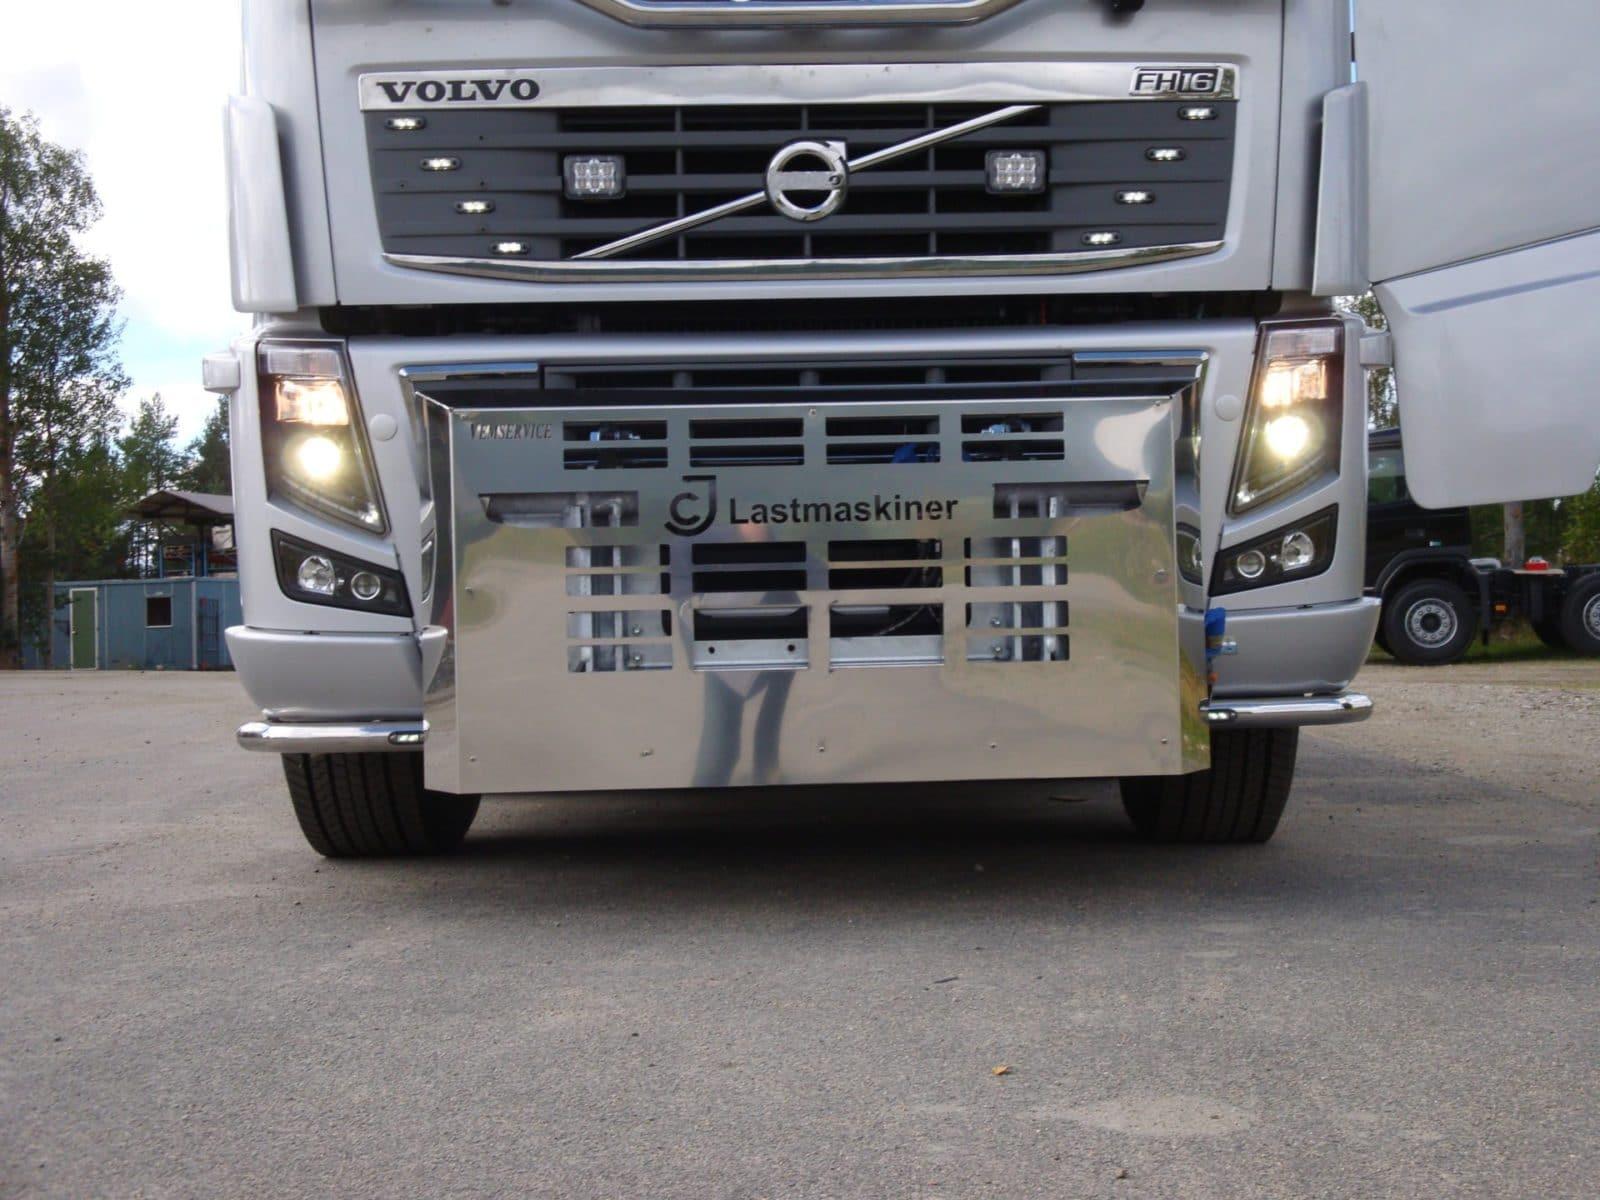 1023315-cj-lastmaskiner-25